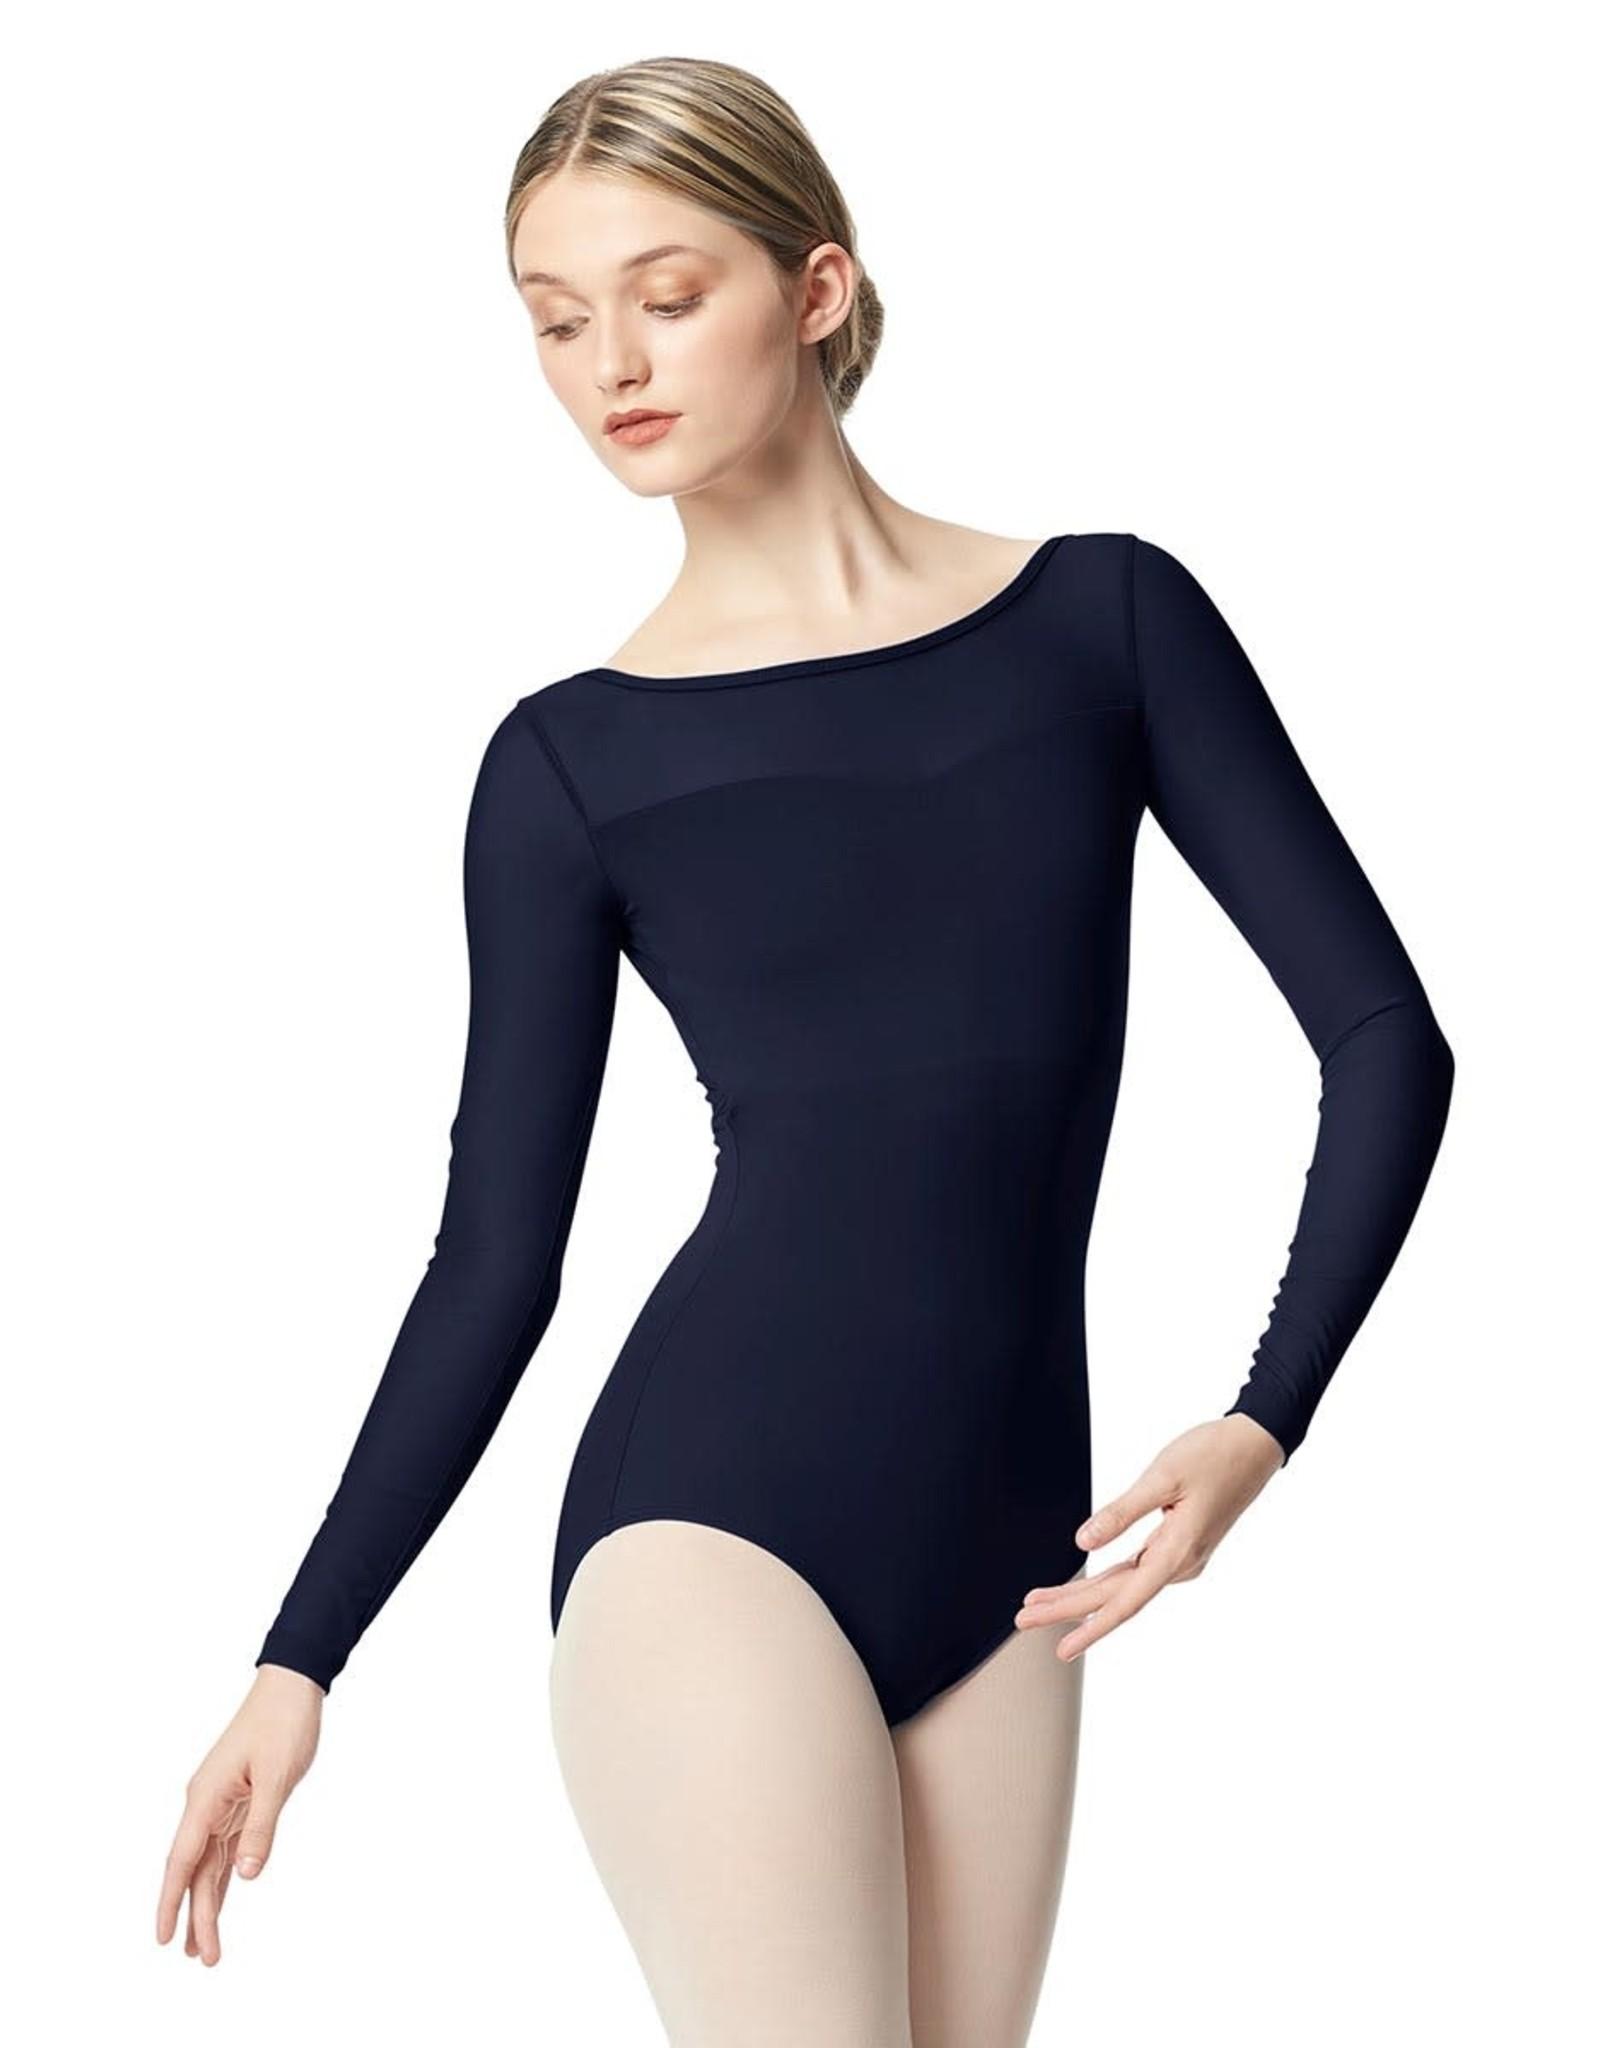 Lulli Dancewear Lada Long Sleeve Leotard